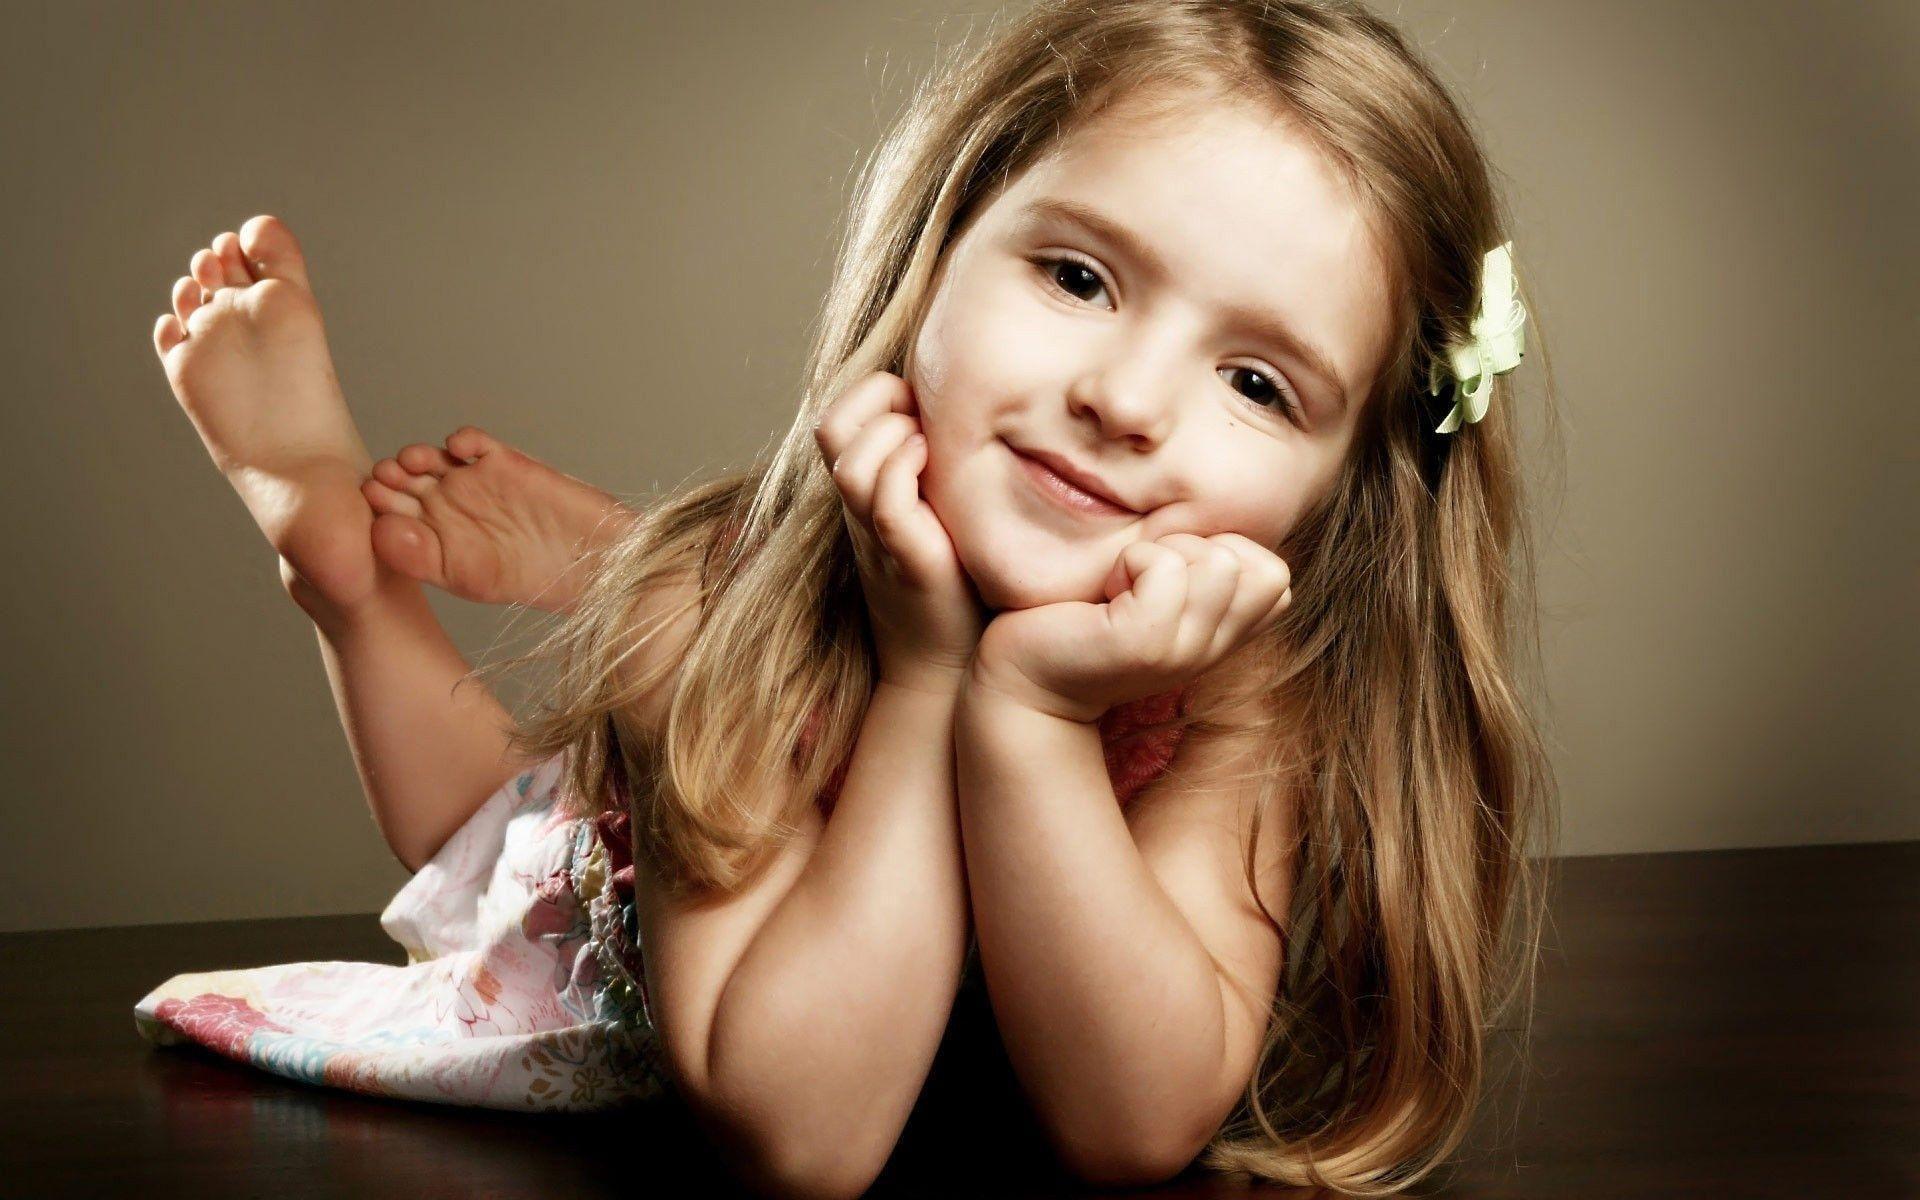 Cute Girl Wallpapers Wallpaper Cave Baby Girl Wallpaper Cute Baby Girl Cute Little Girl Dresses